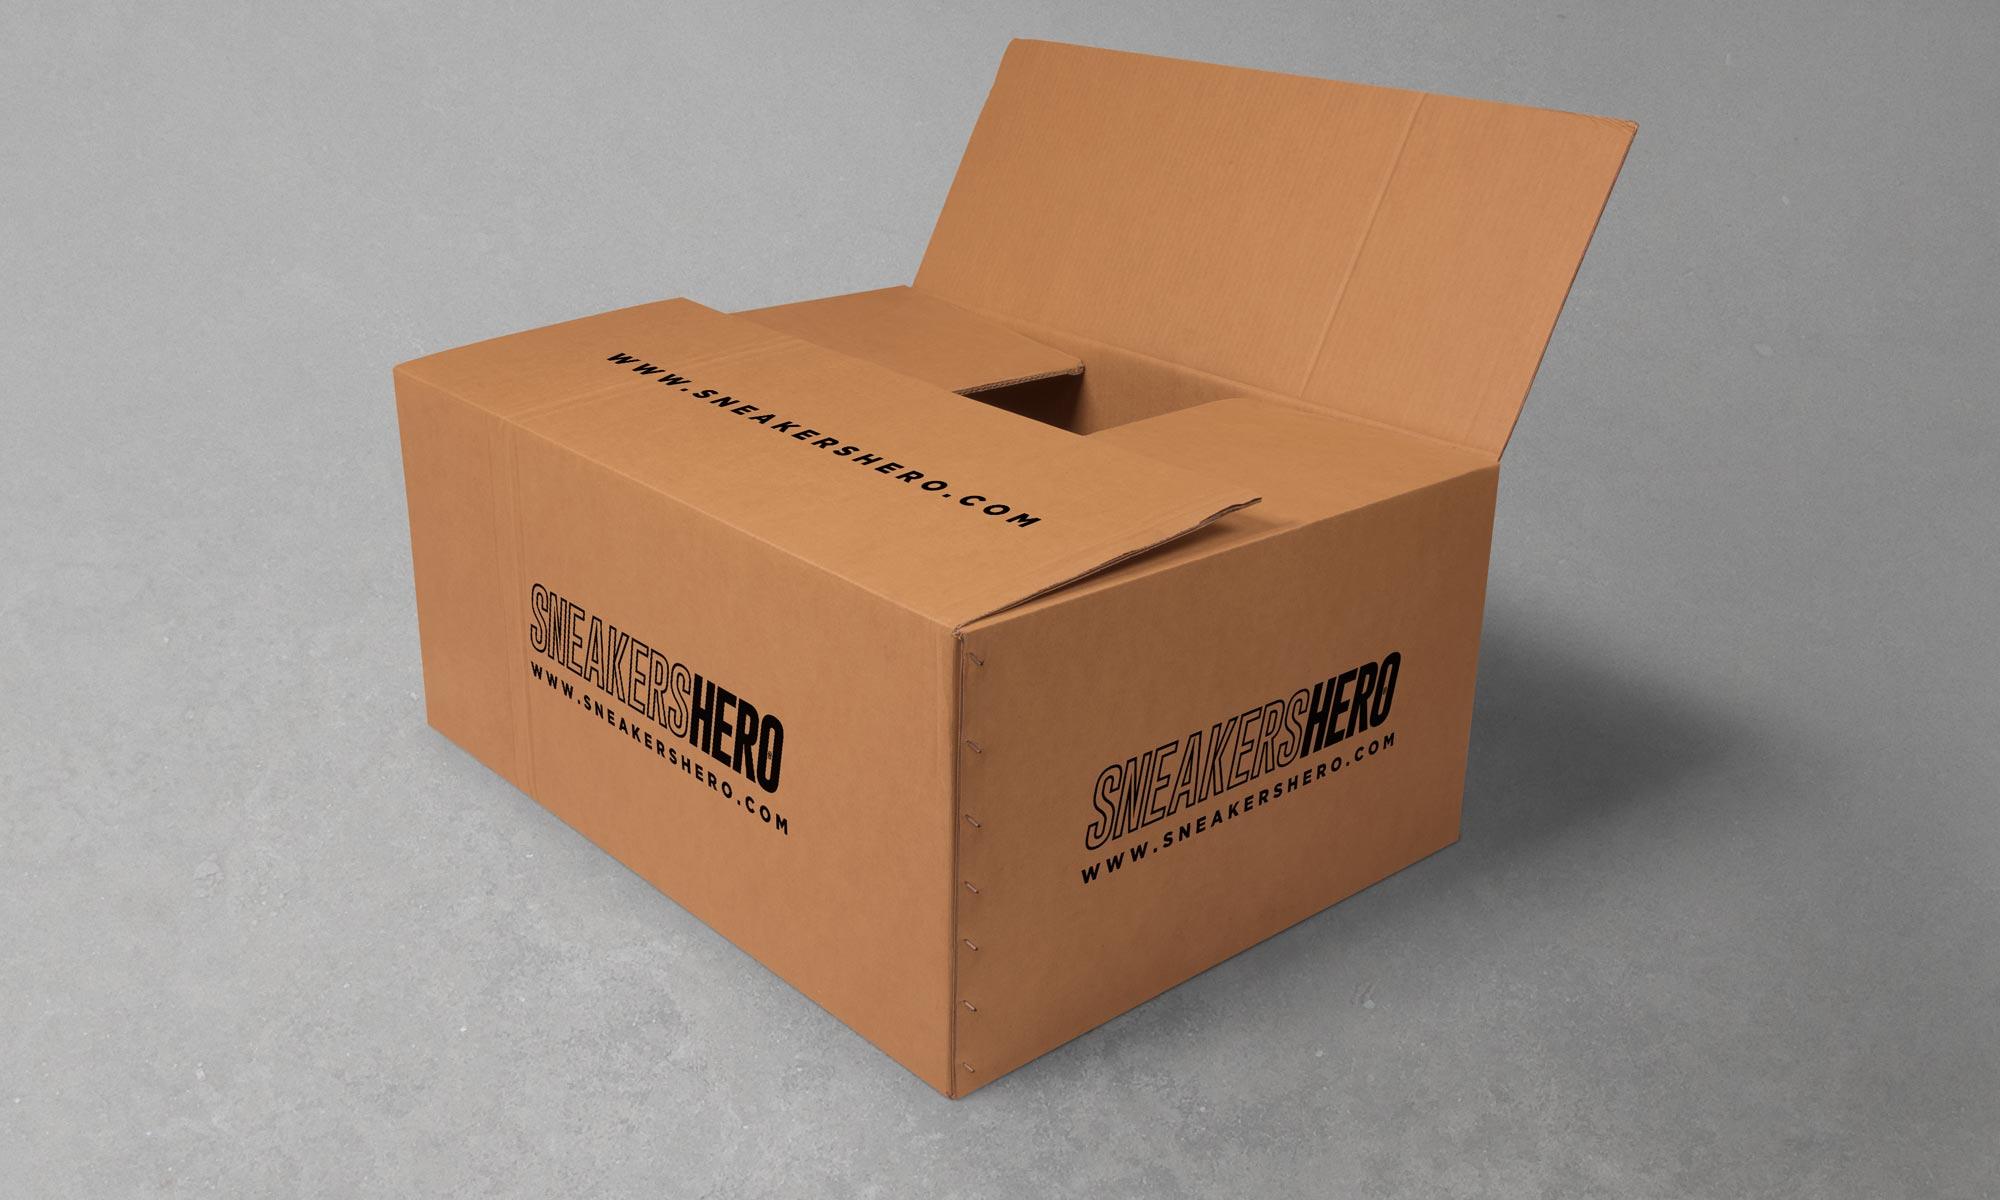 https://www.atelierzoz.com/wp-content/uploads/2020/03/works_sneakershero-3.jpg